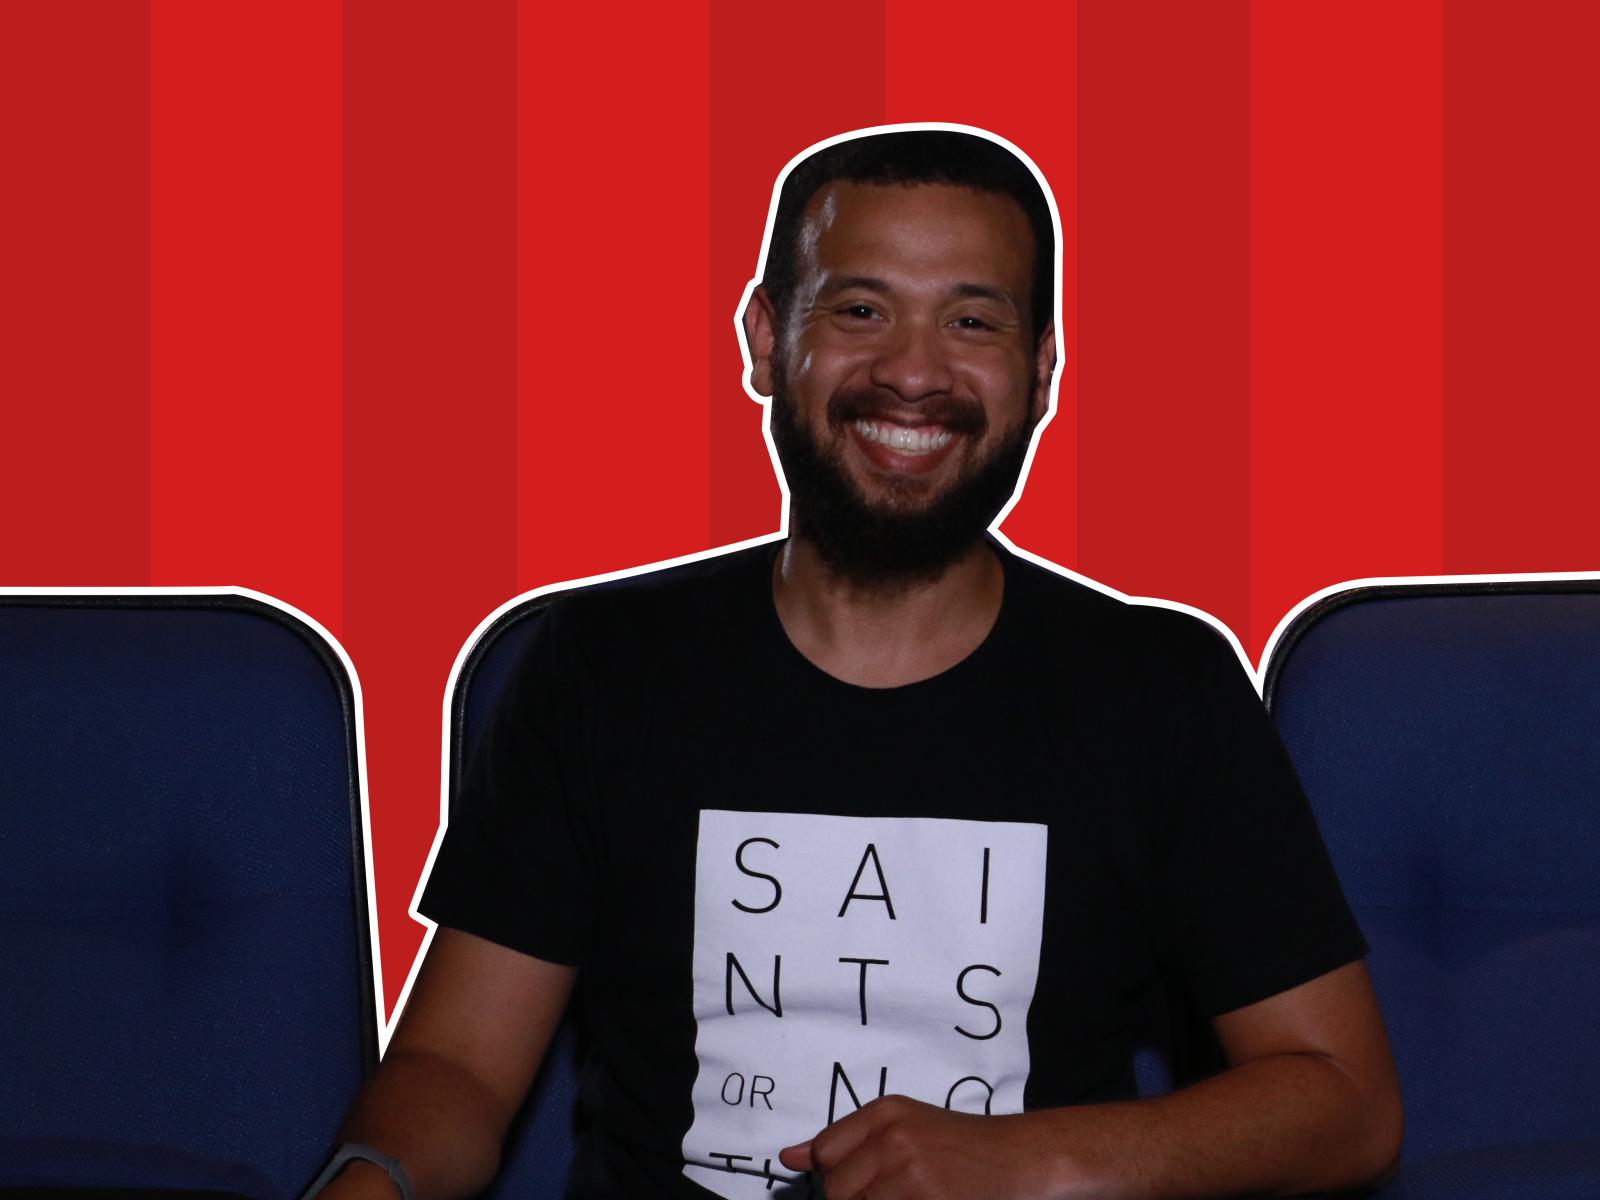 Minuto Popcorn com Guilherme Christóvão #17